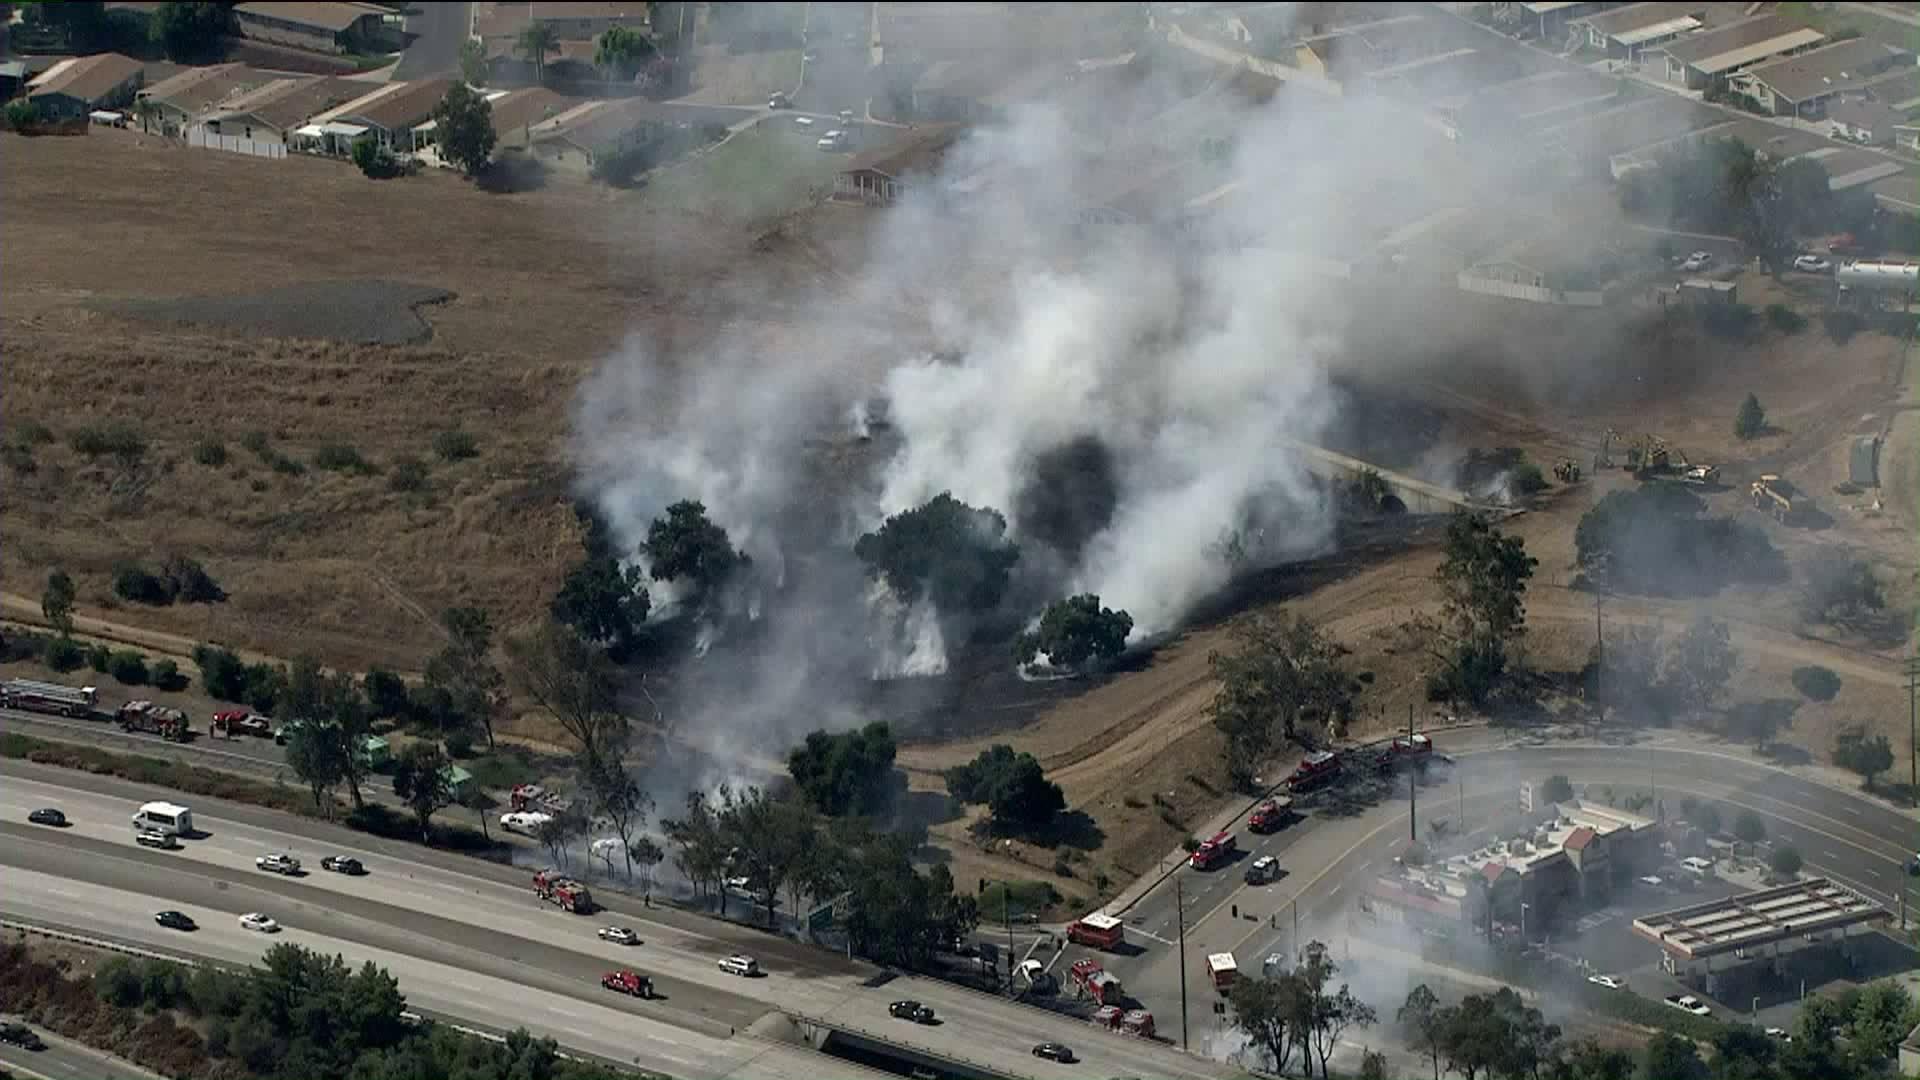 Firefighters battle a brush fire along the 210 Freeway in Sylmar on Aug. 9, 2019. (Credit: KTLA)